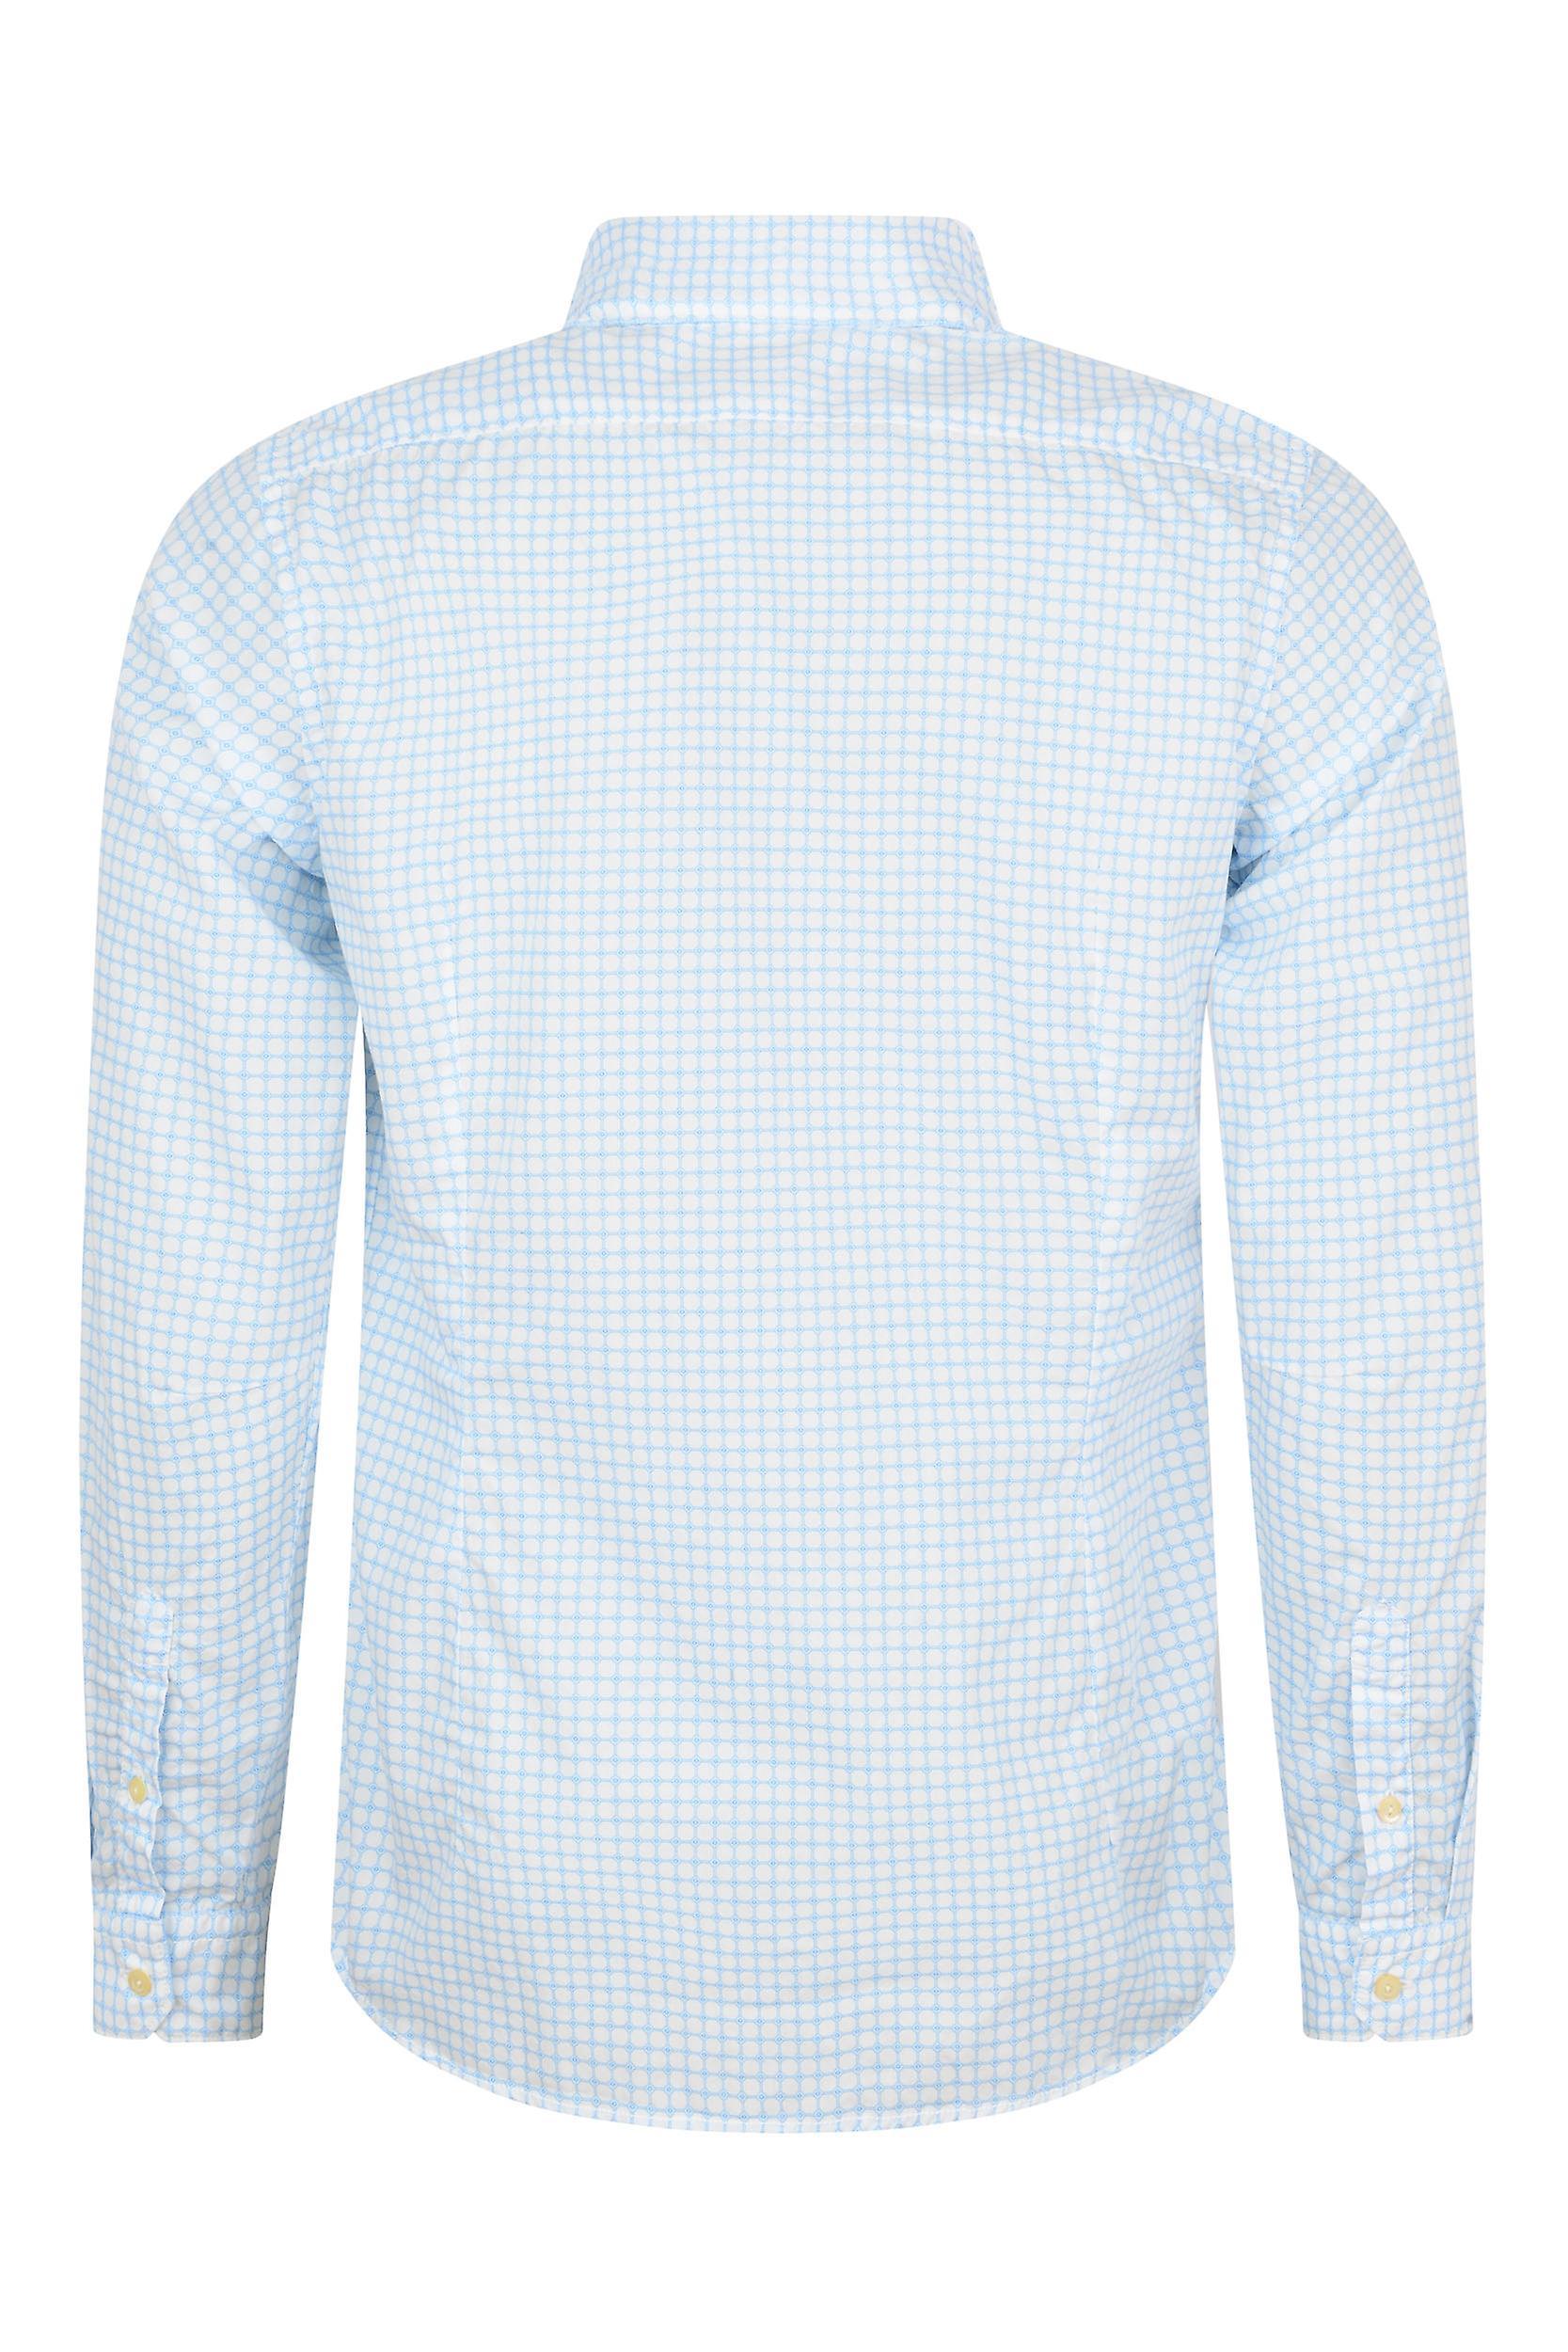 Fabio Giovanni Corsano Shirt - Mens Italian Stylish Casual Shirt - Long Sleeve